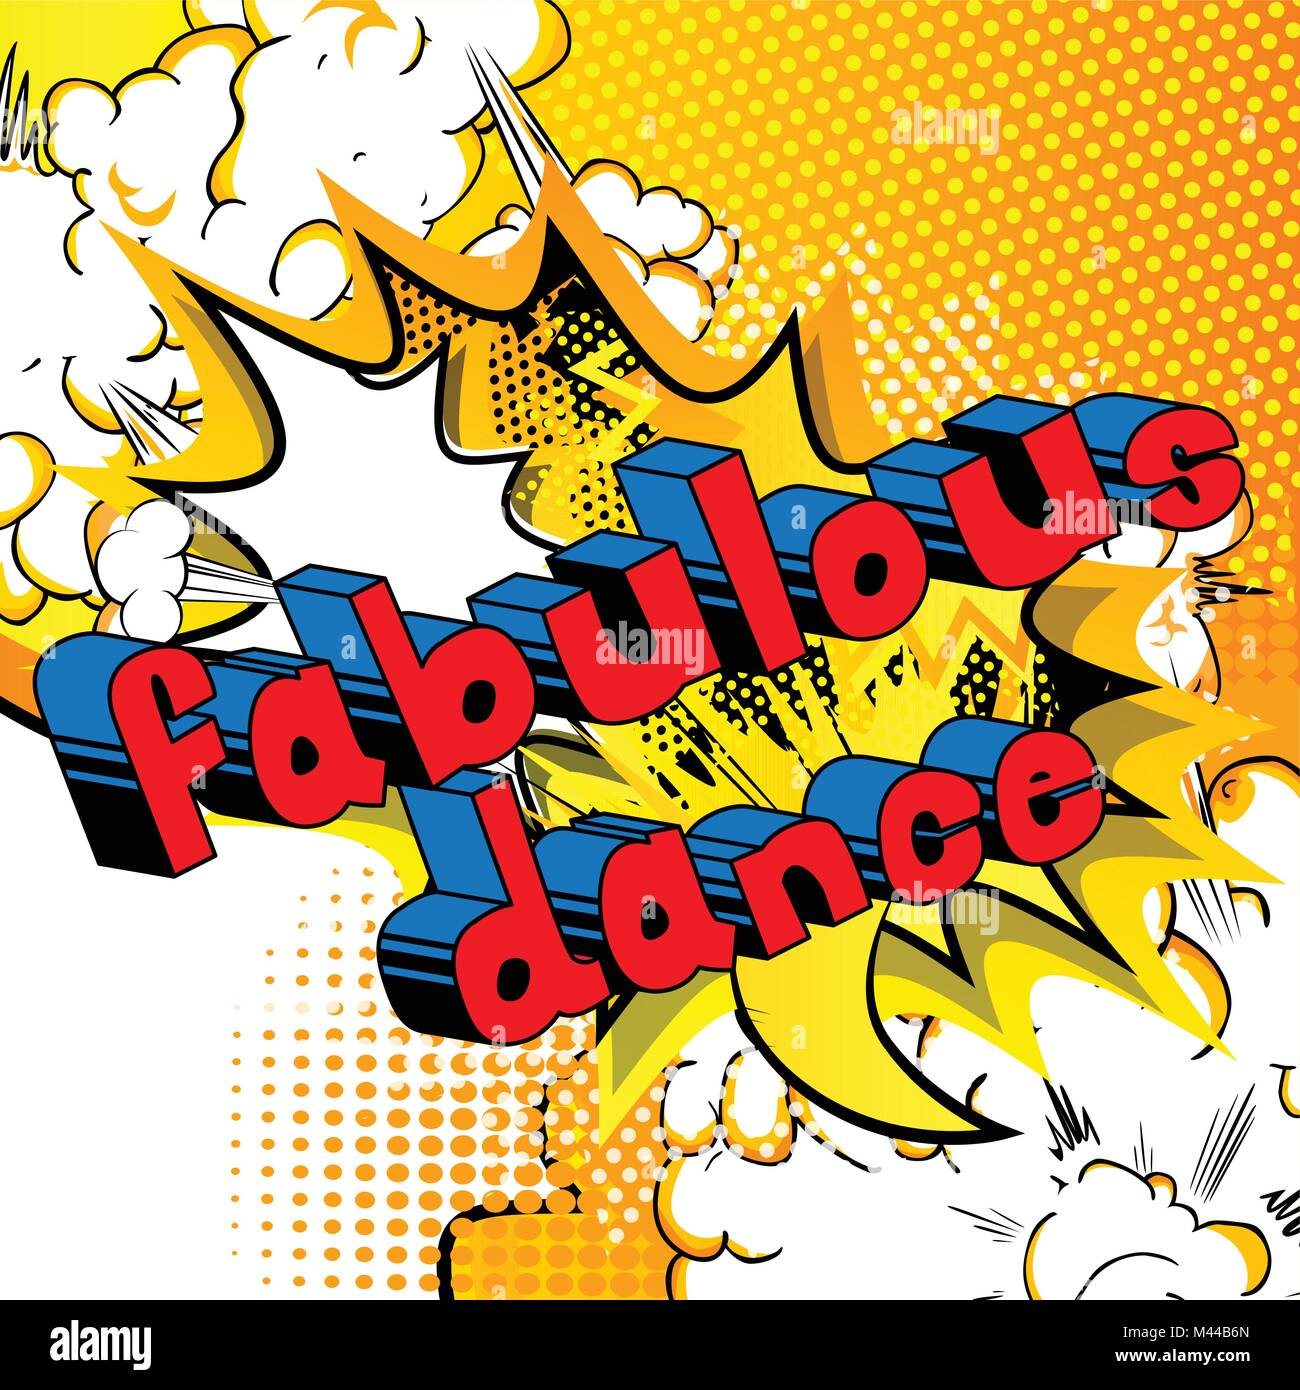 Free Comic Book Day Flyer: Dance Club Card Stock Photos & Dance Club Card Stock